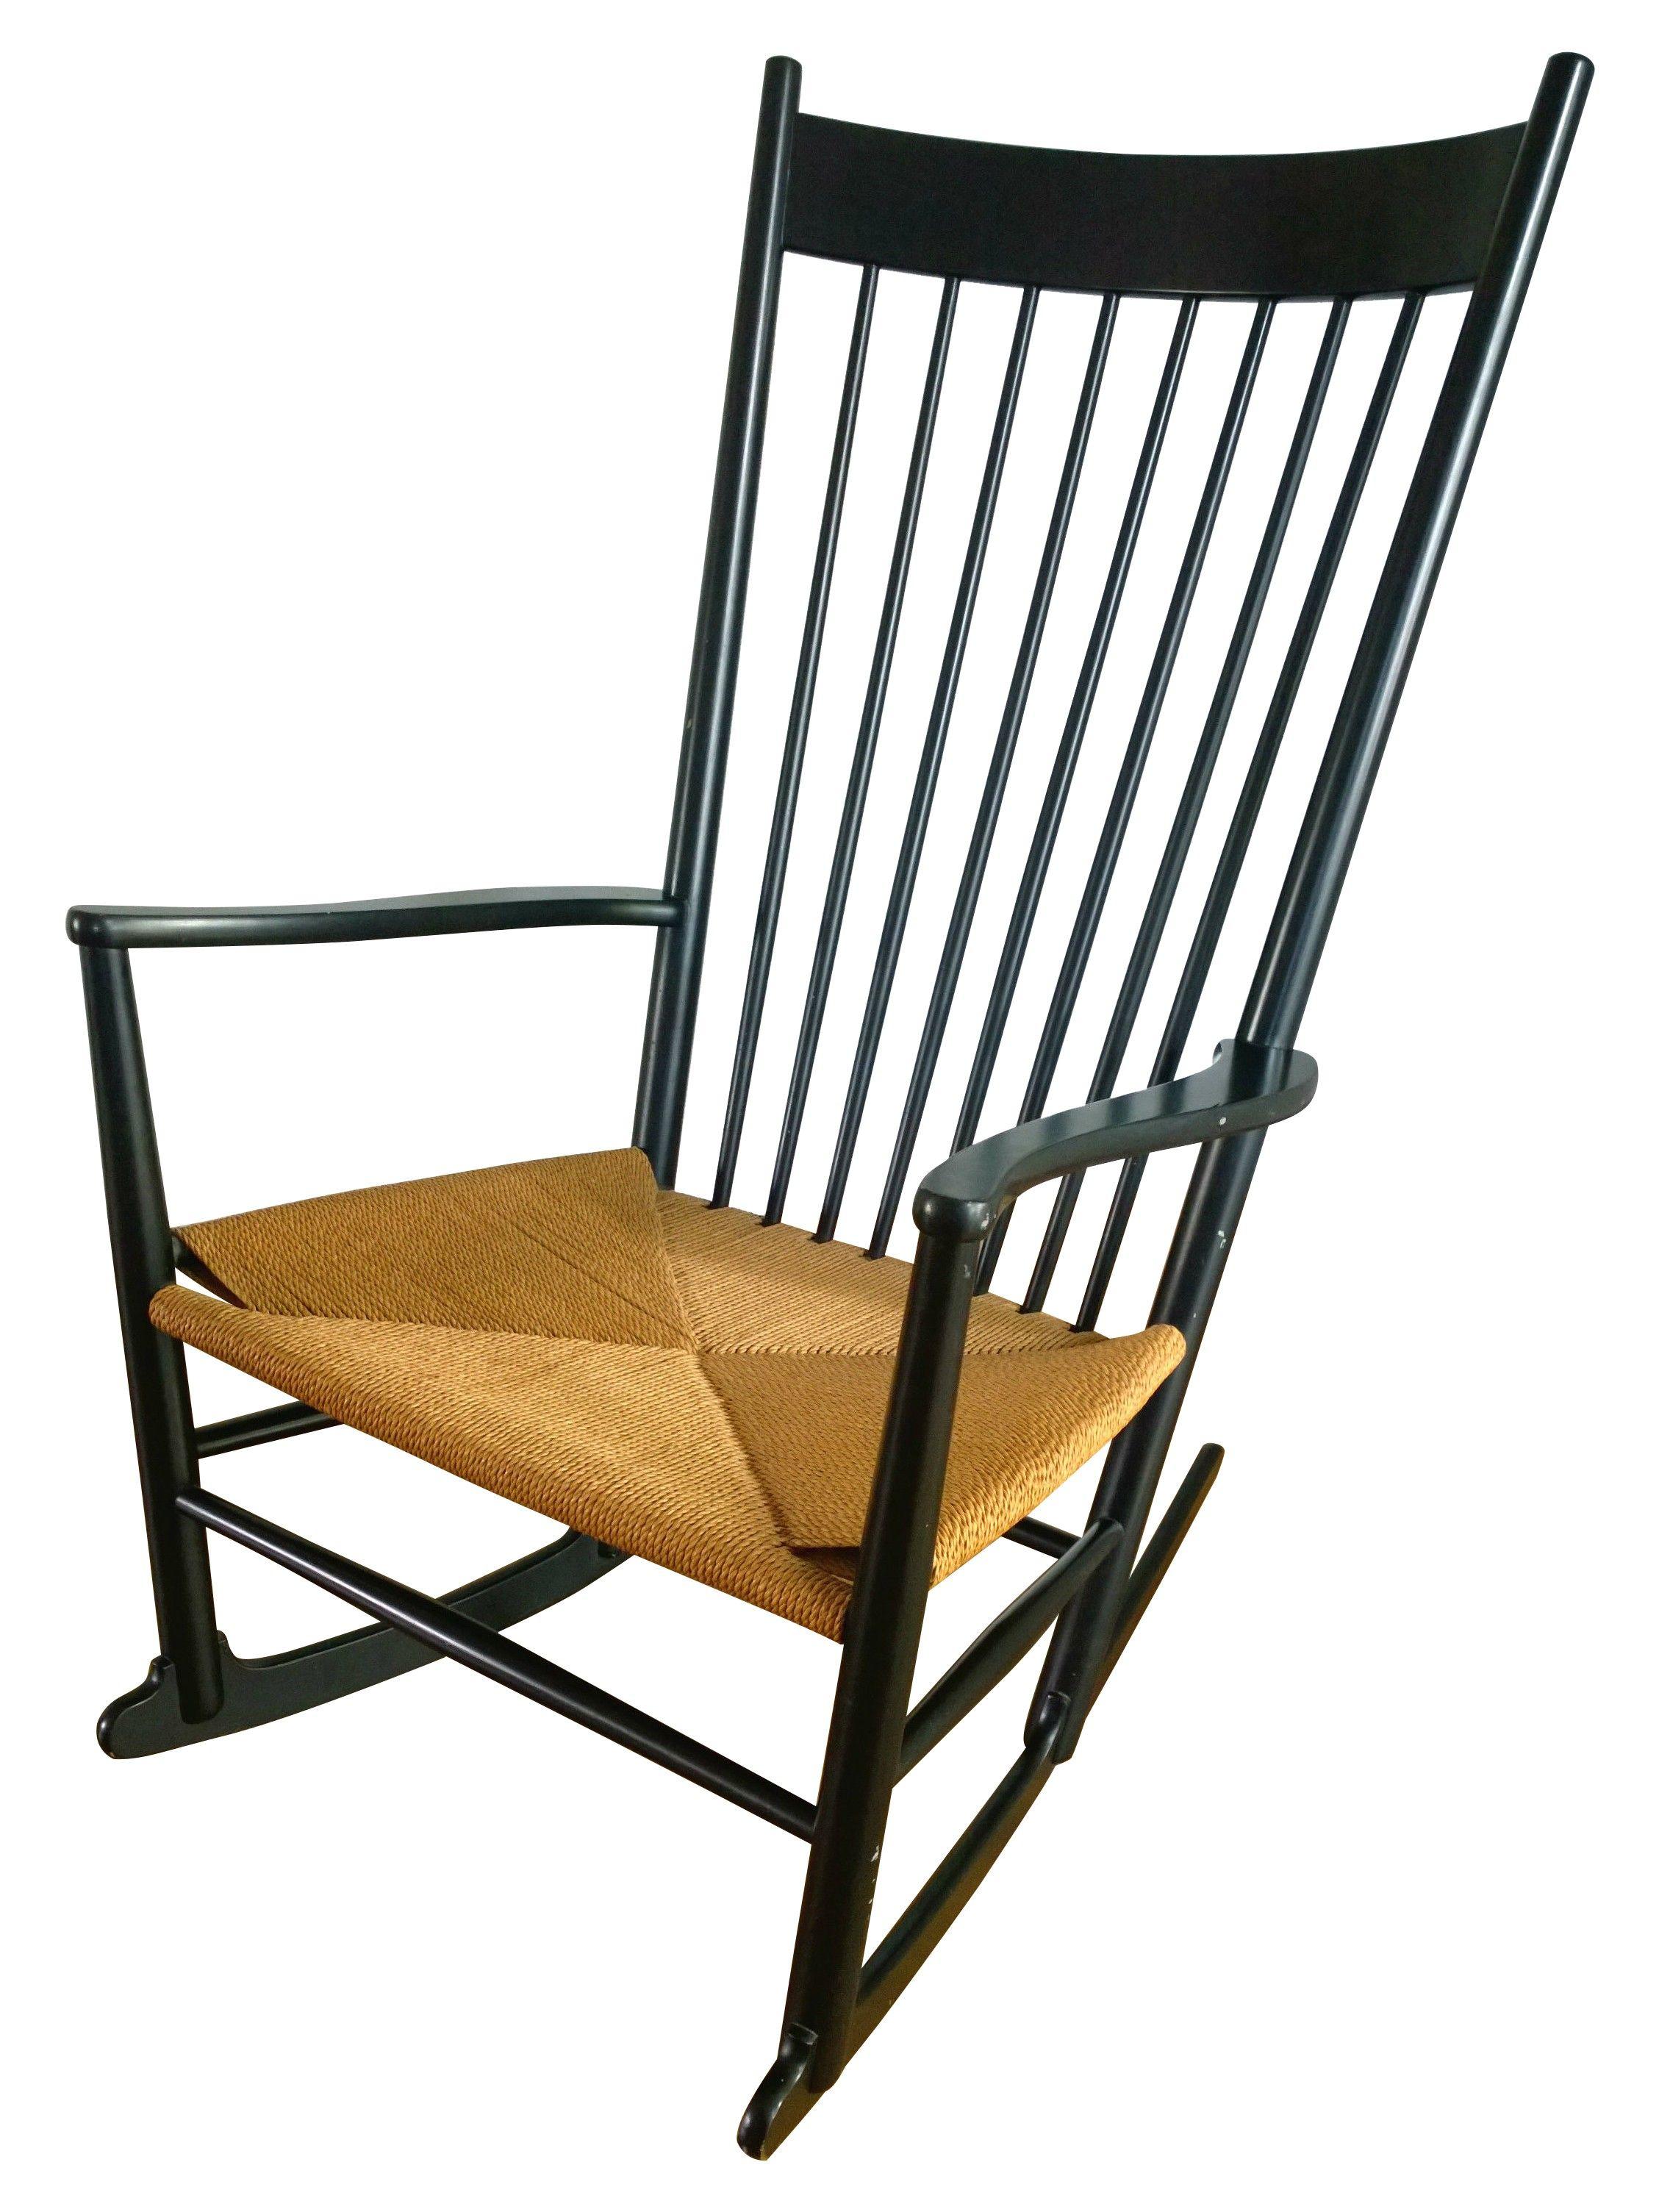 Rocking Chair J16 In Beech Hans Wegner 1966 Design Market Rocking Chair Painted Rocking Chairs Chair